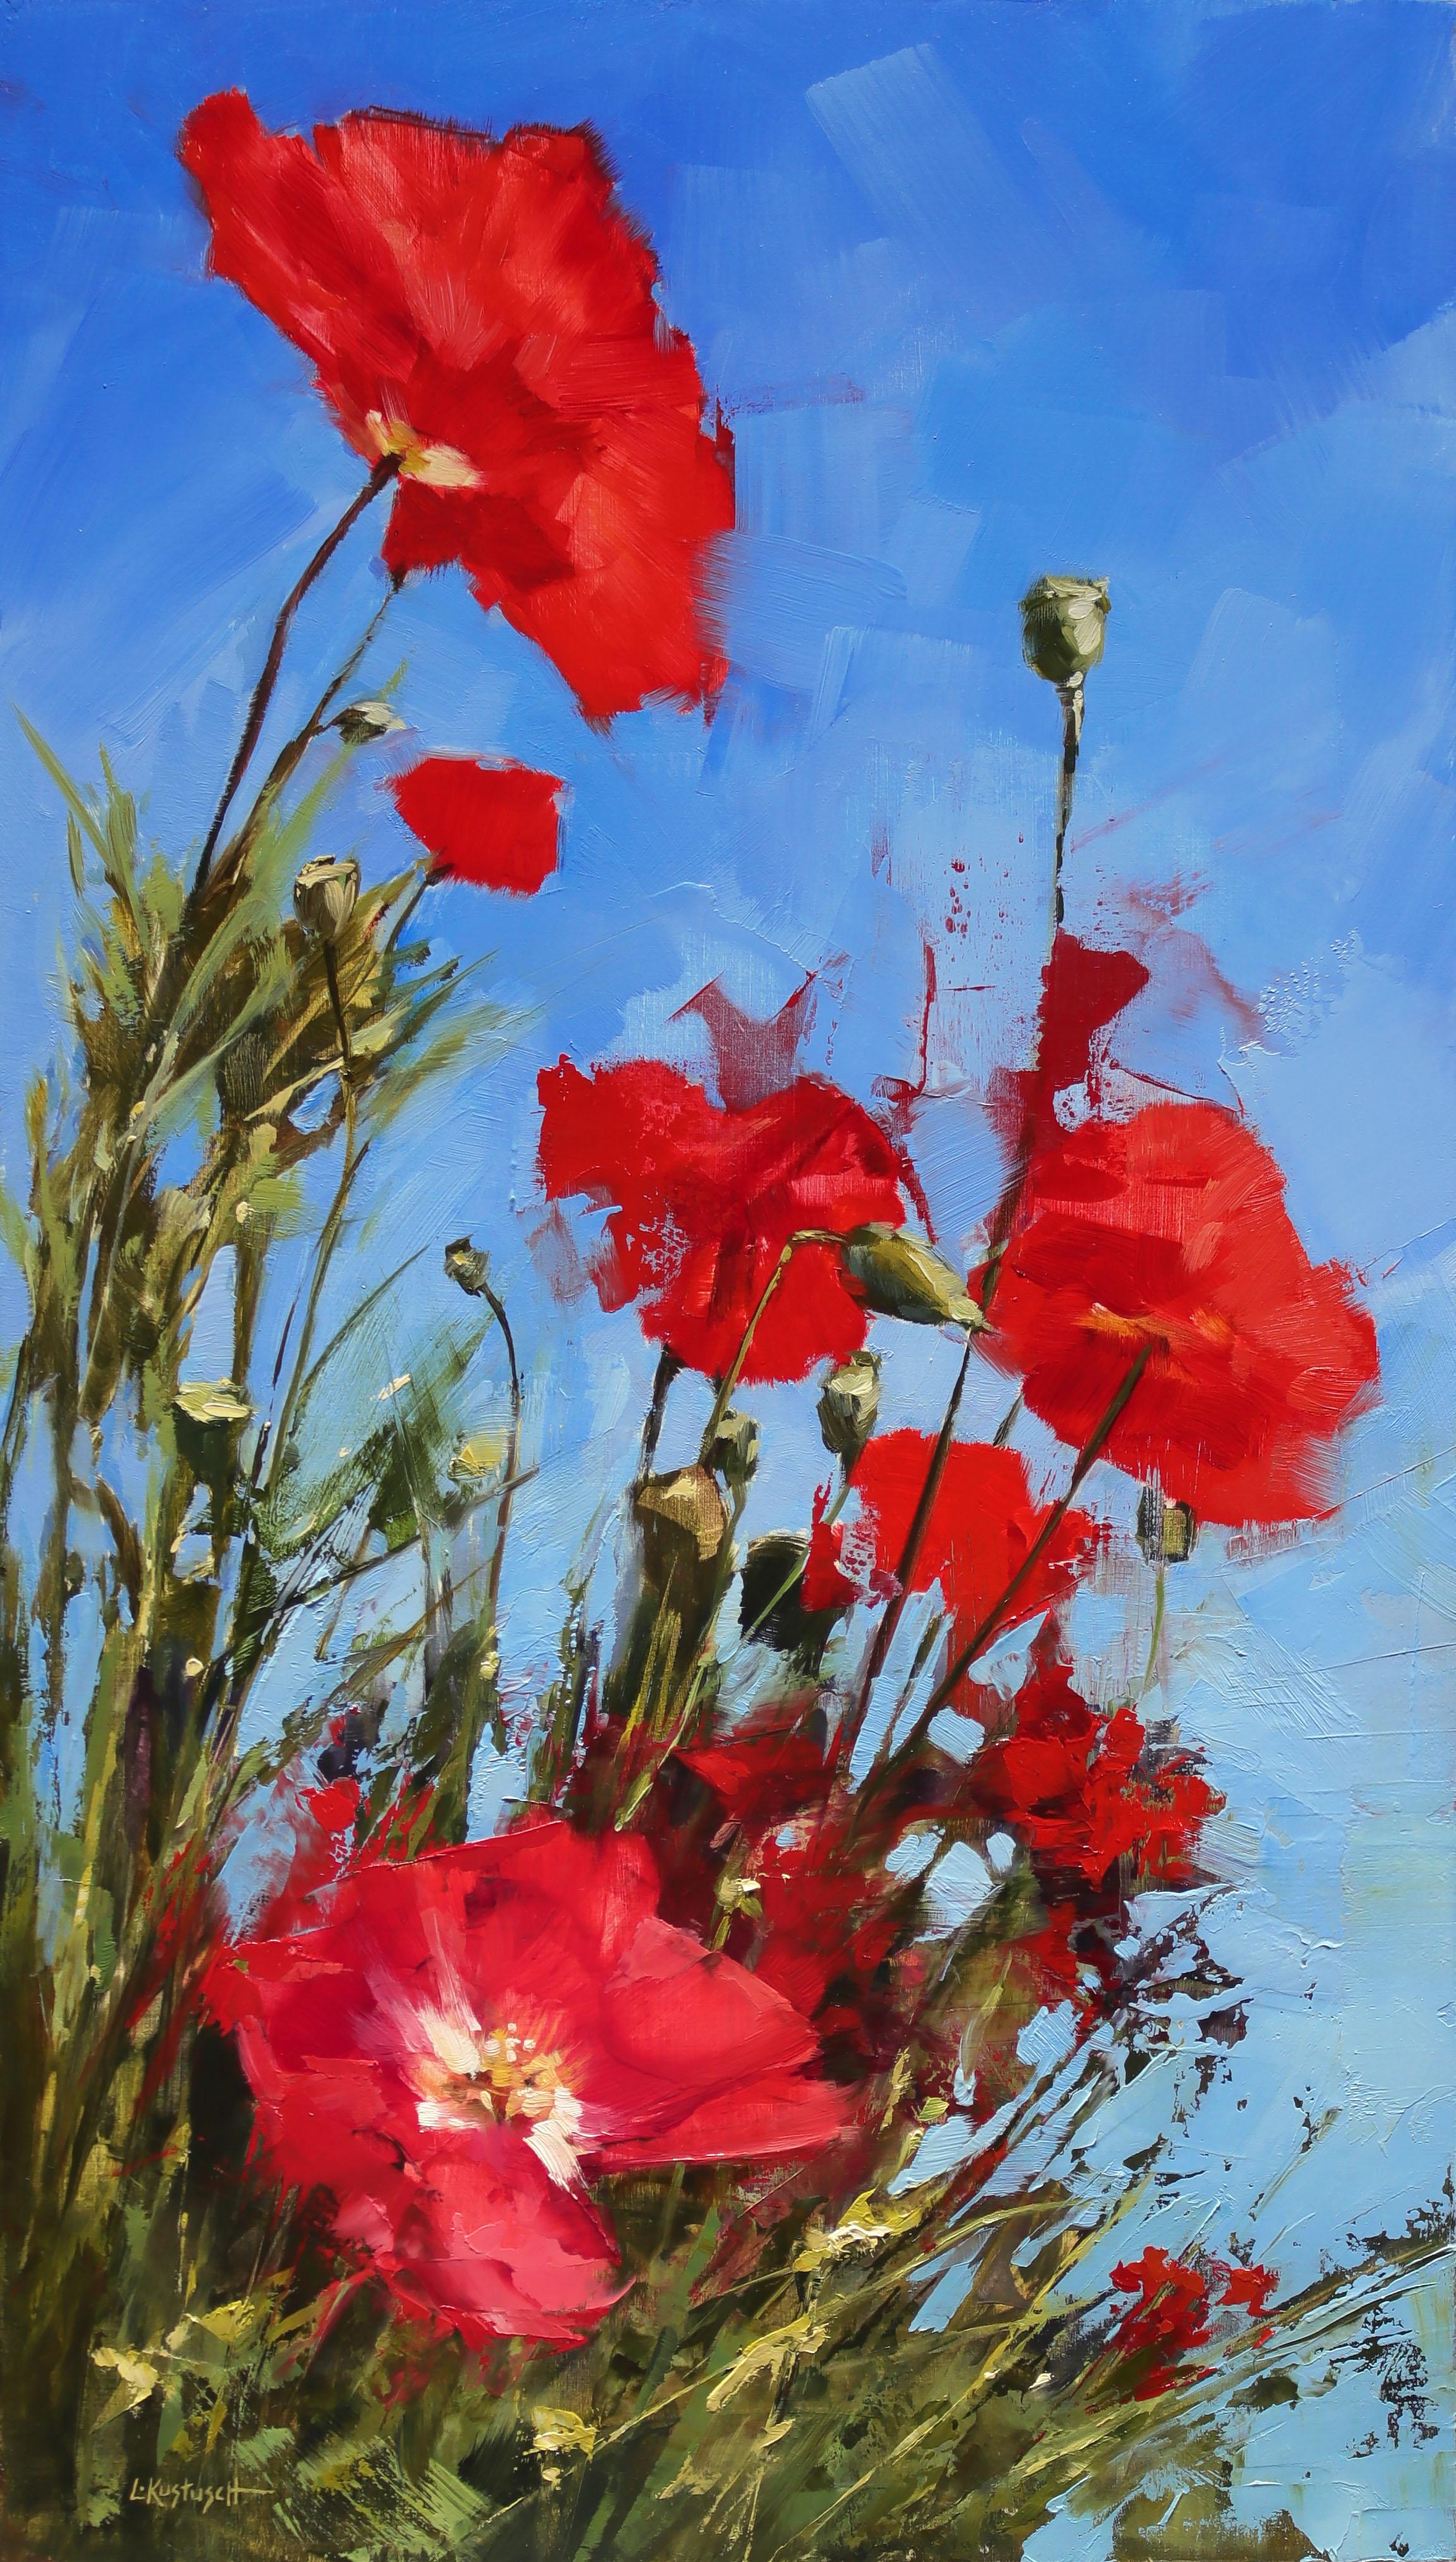 Lindsey Kustusch_%22Roadside Poppies%22_21%22x12%22_oil on panel_$2,800.jpg